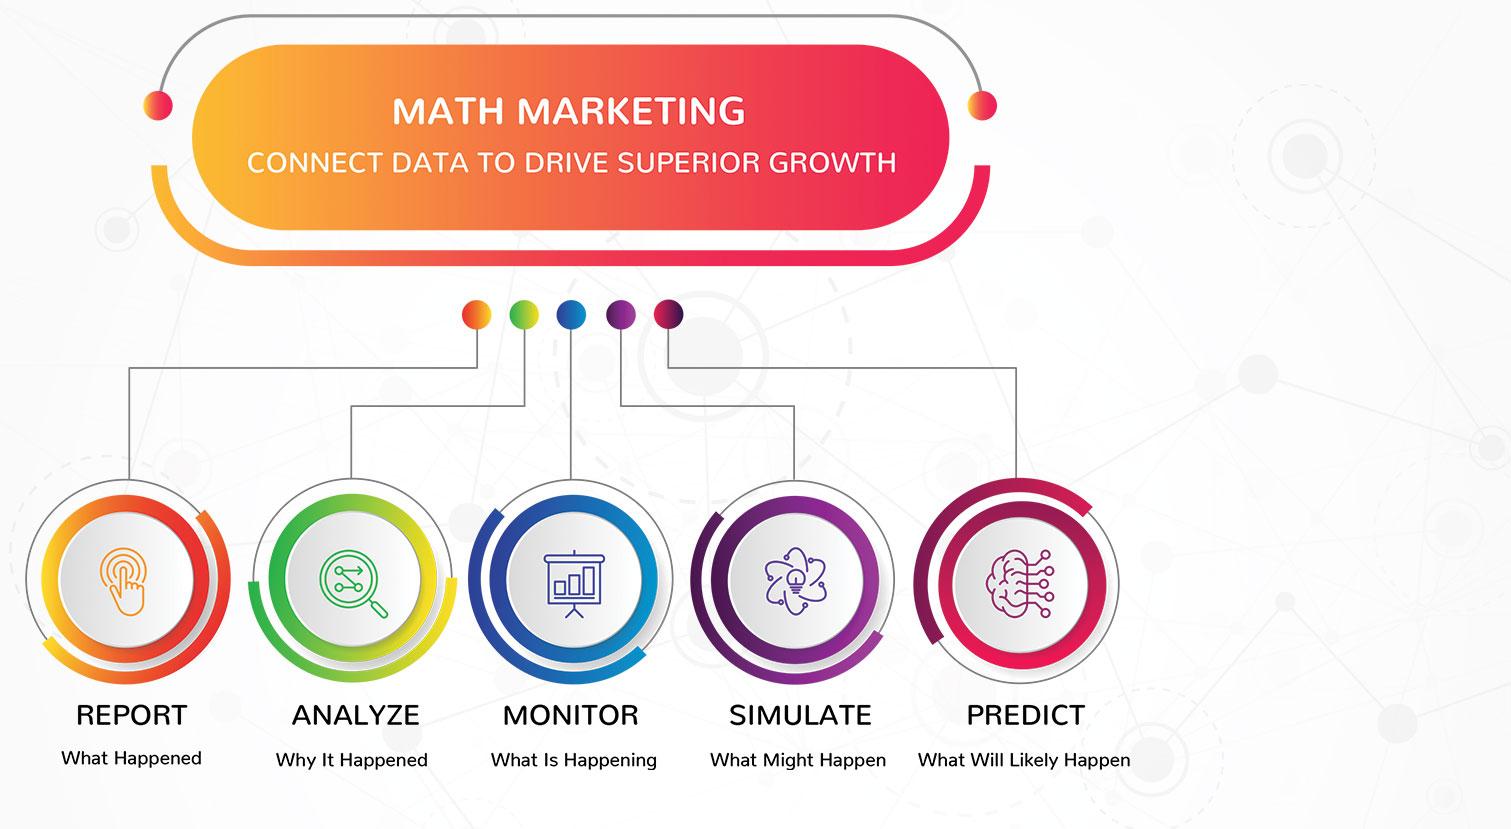 Math marketing, predictive intelligence